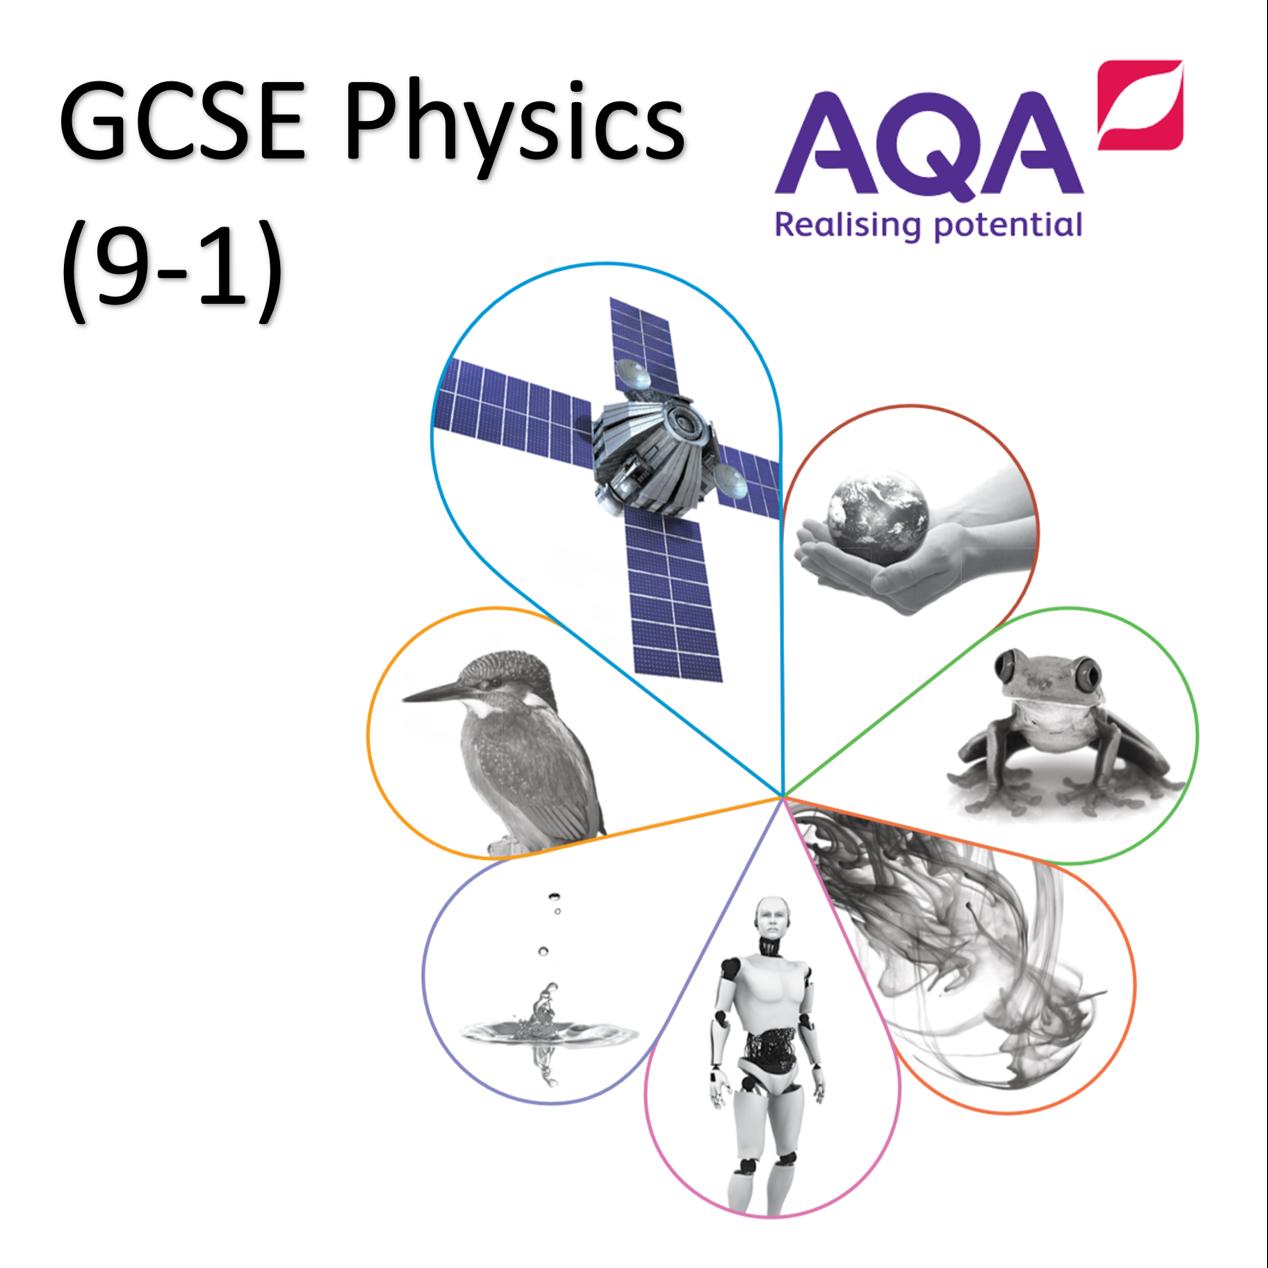 AQA GCSE Physics (9-1) Paper 2 Double Science Revision Summary Sheets